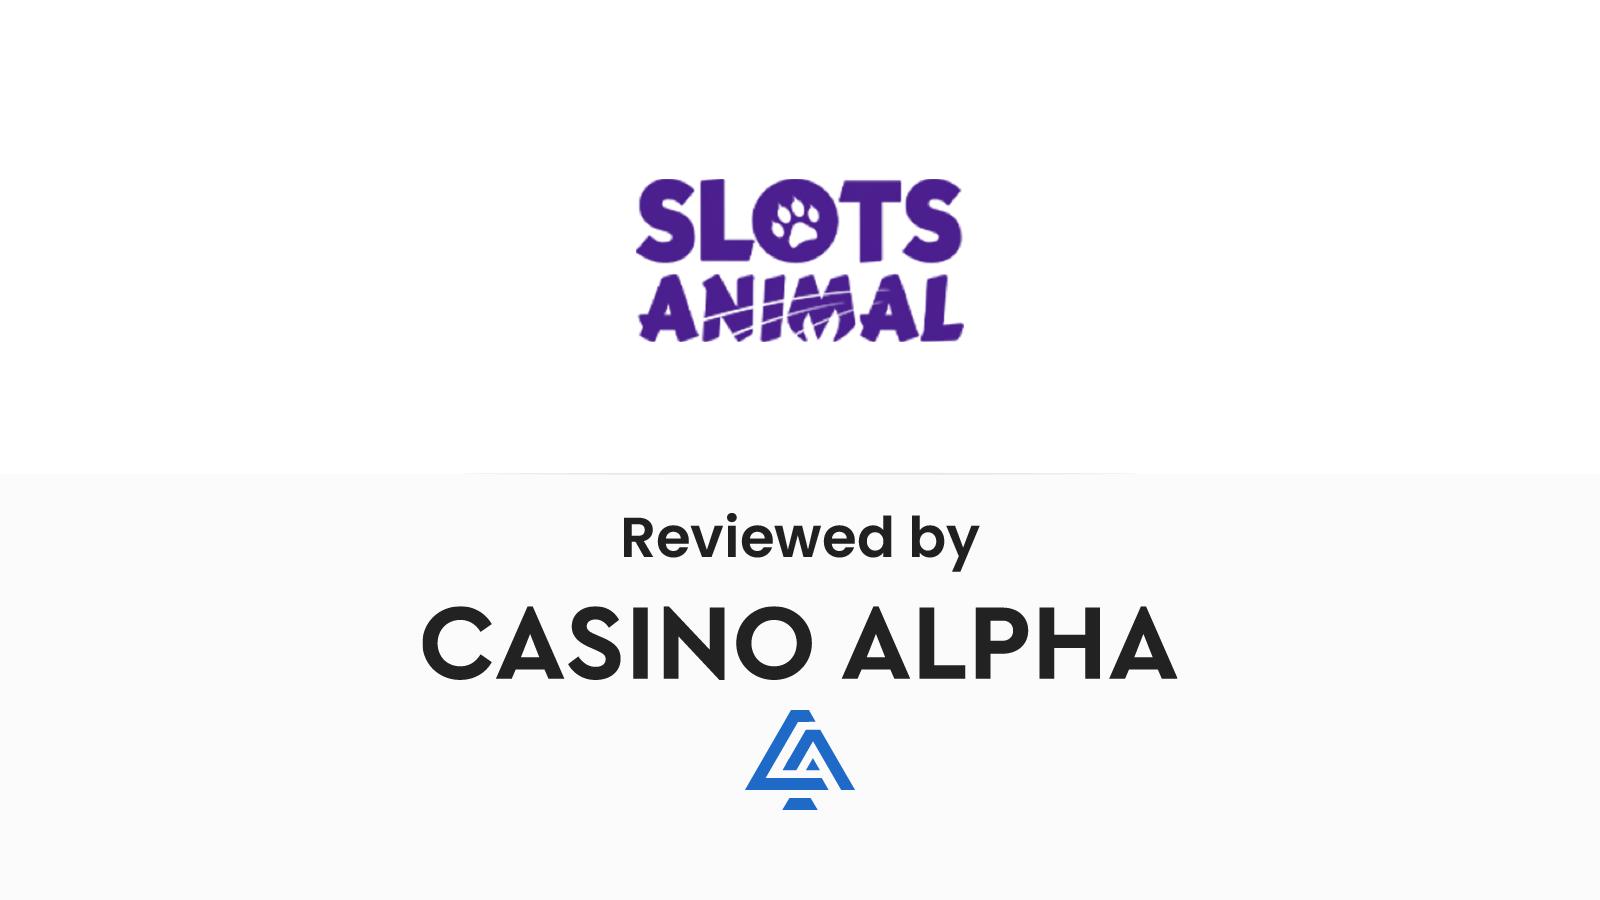 Slots Animal Review & Promo codes